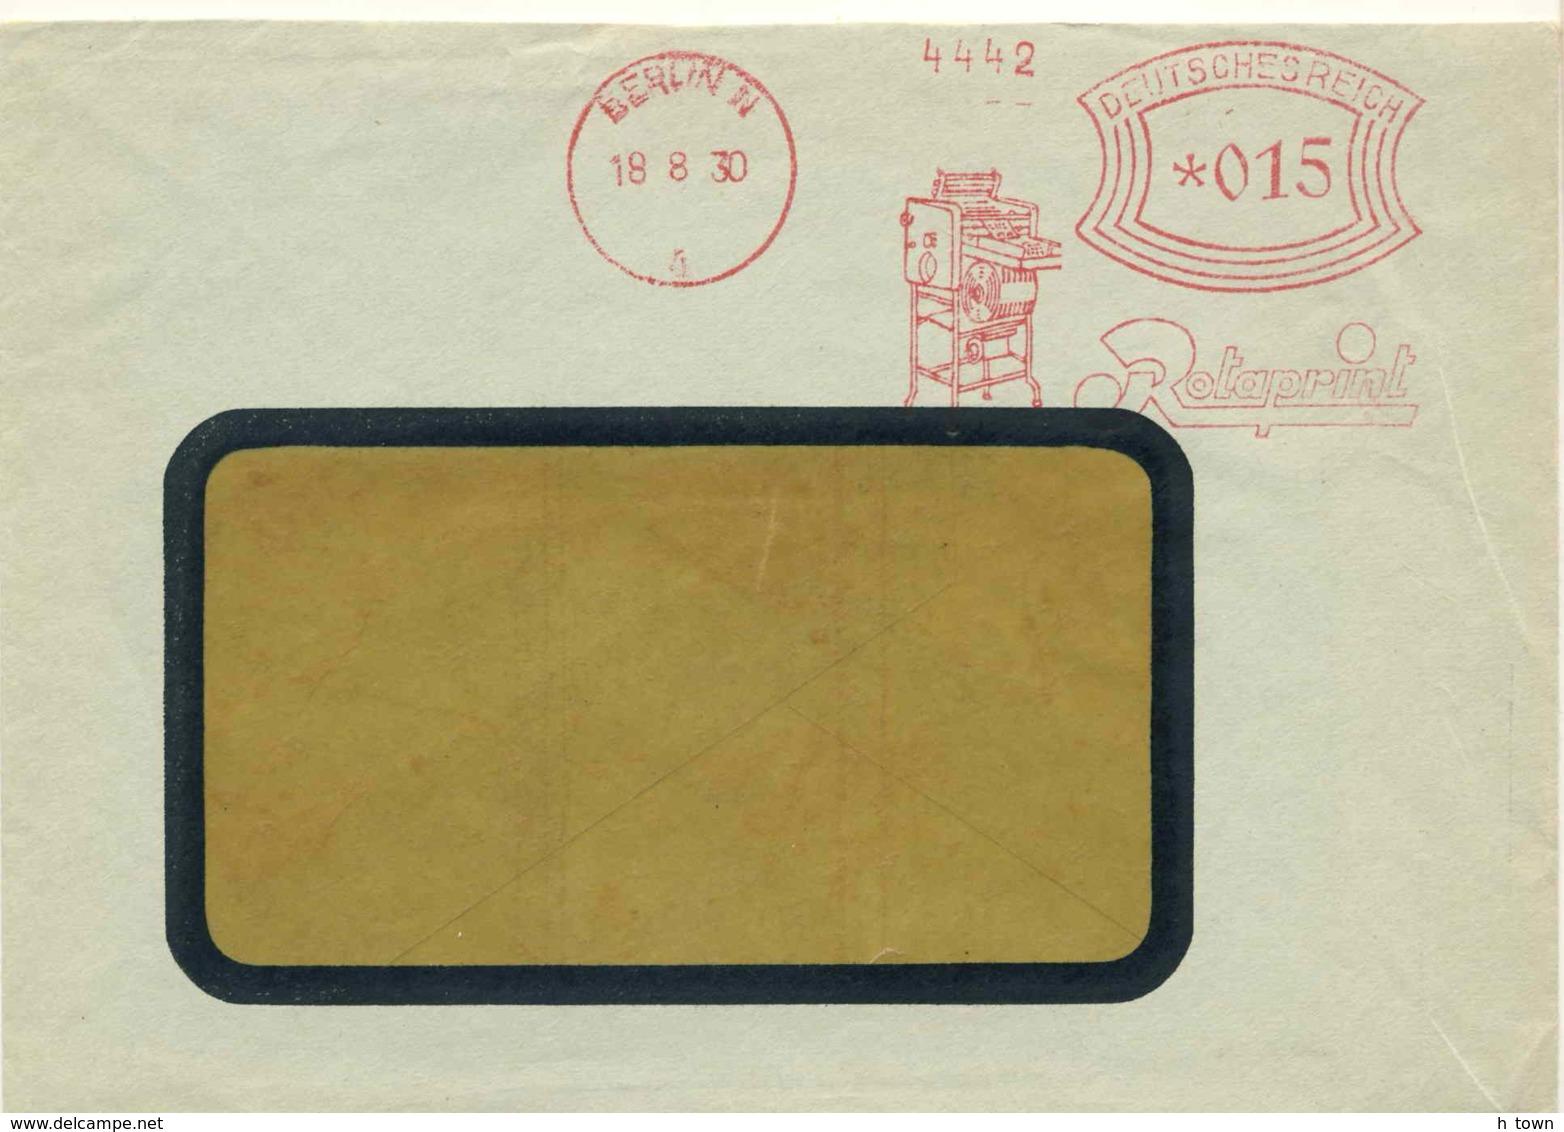 7270  Presse, Imprimerie: Ema D'Allemagne, 1930 - Printing Press Meter Stamp From Berlin, Germany. Rotaprint - Usines & Industries